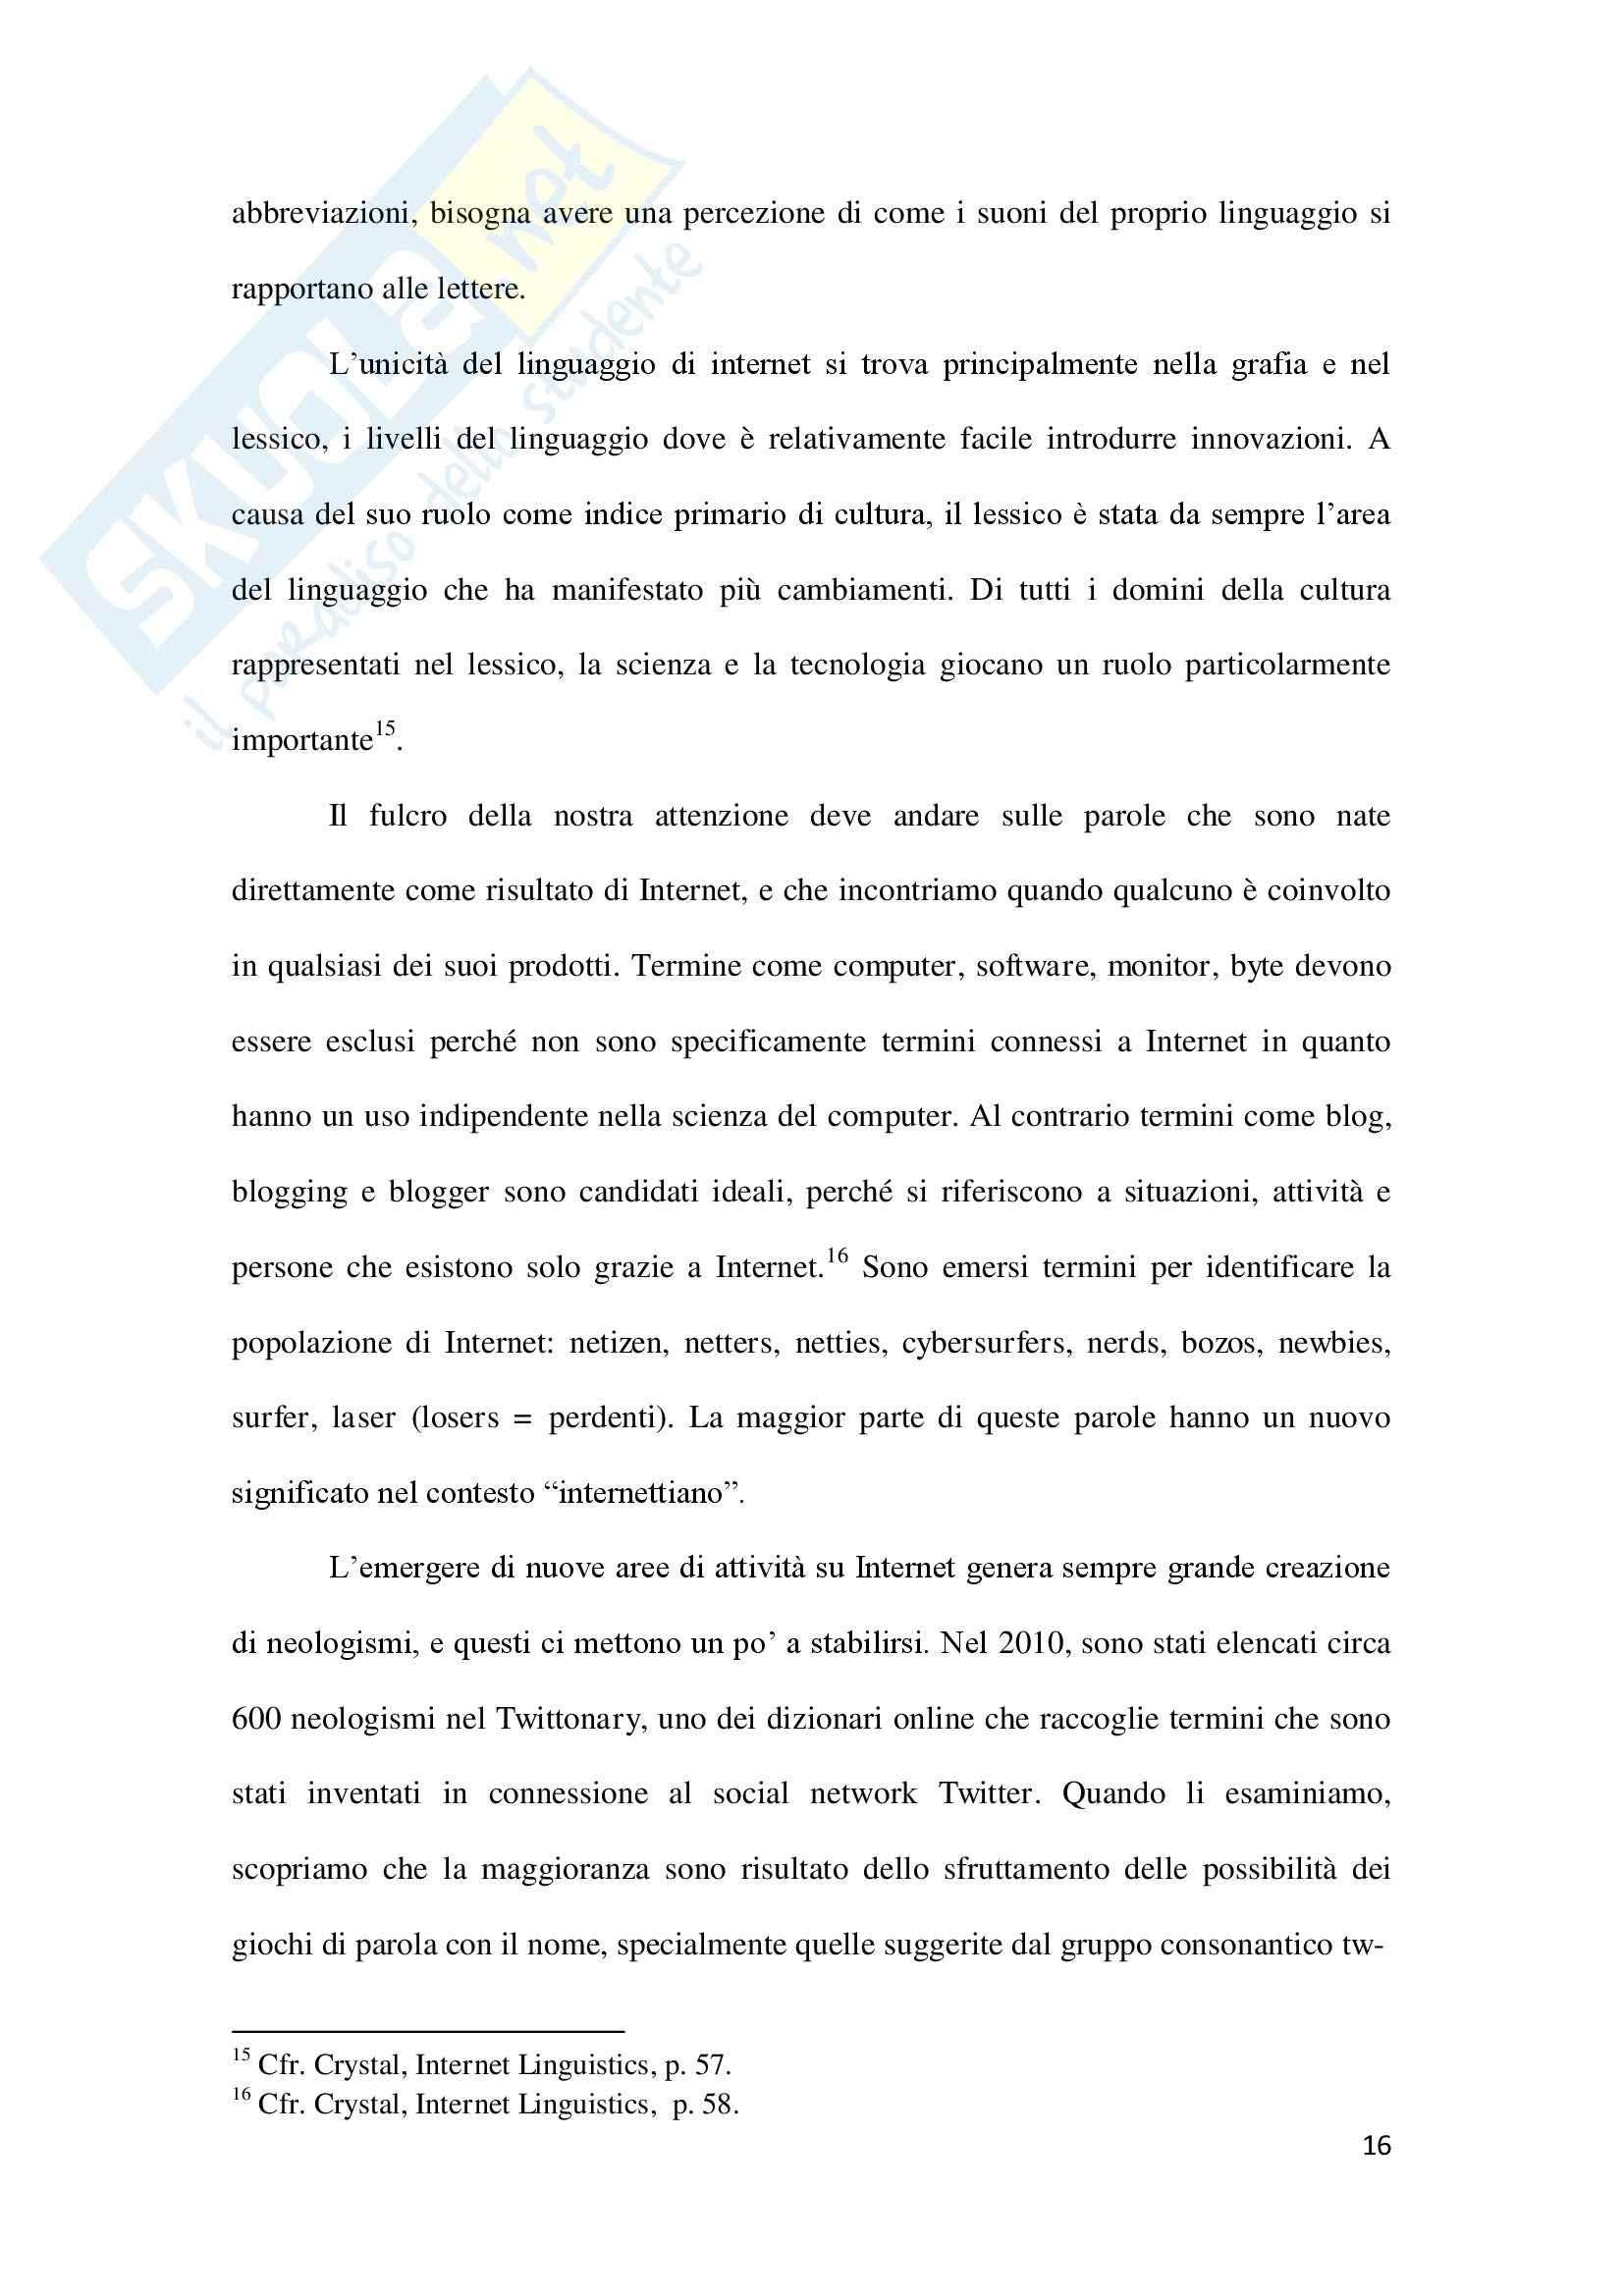 Linguaggio di Internet, Lingua inglese Pag. 16